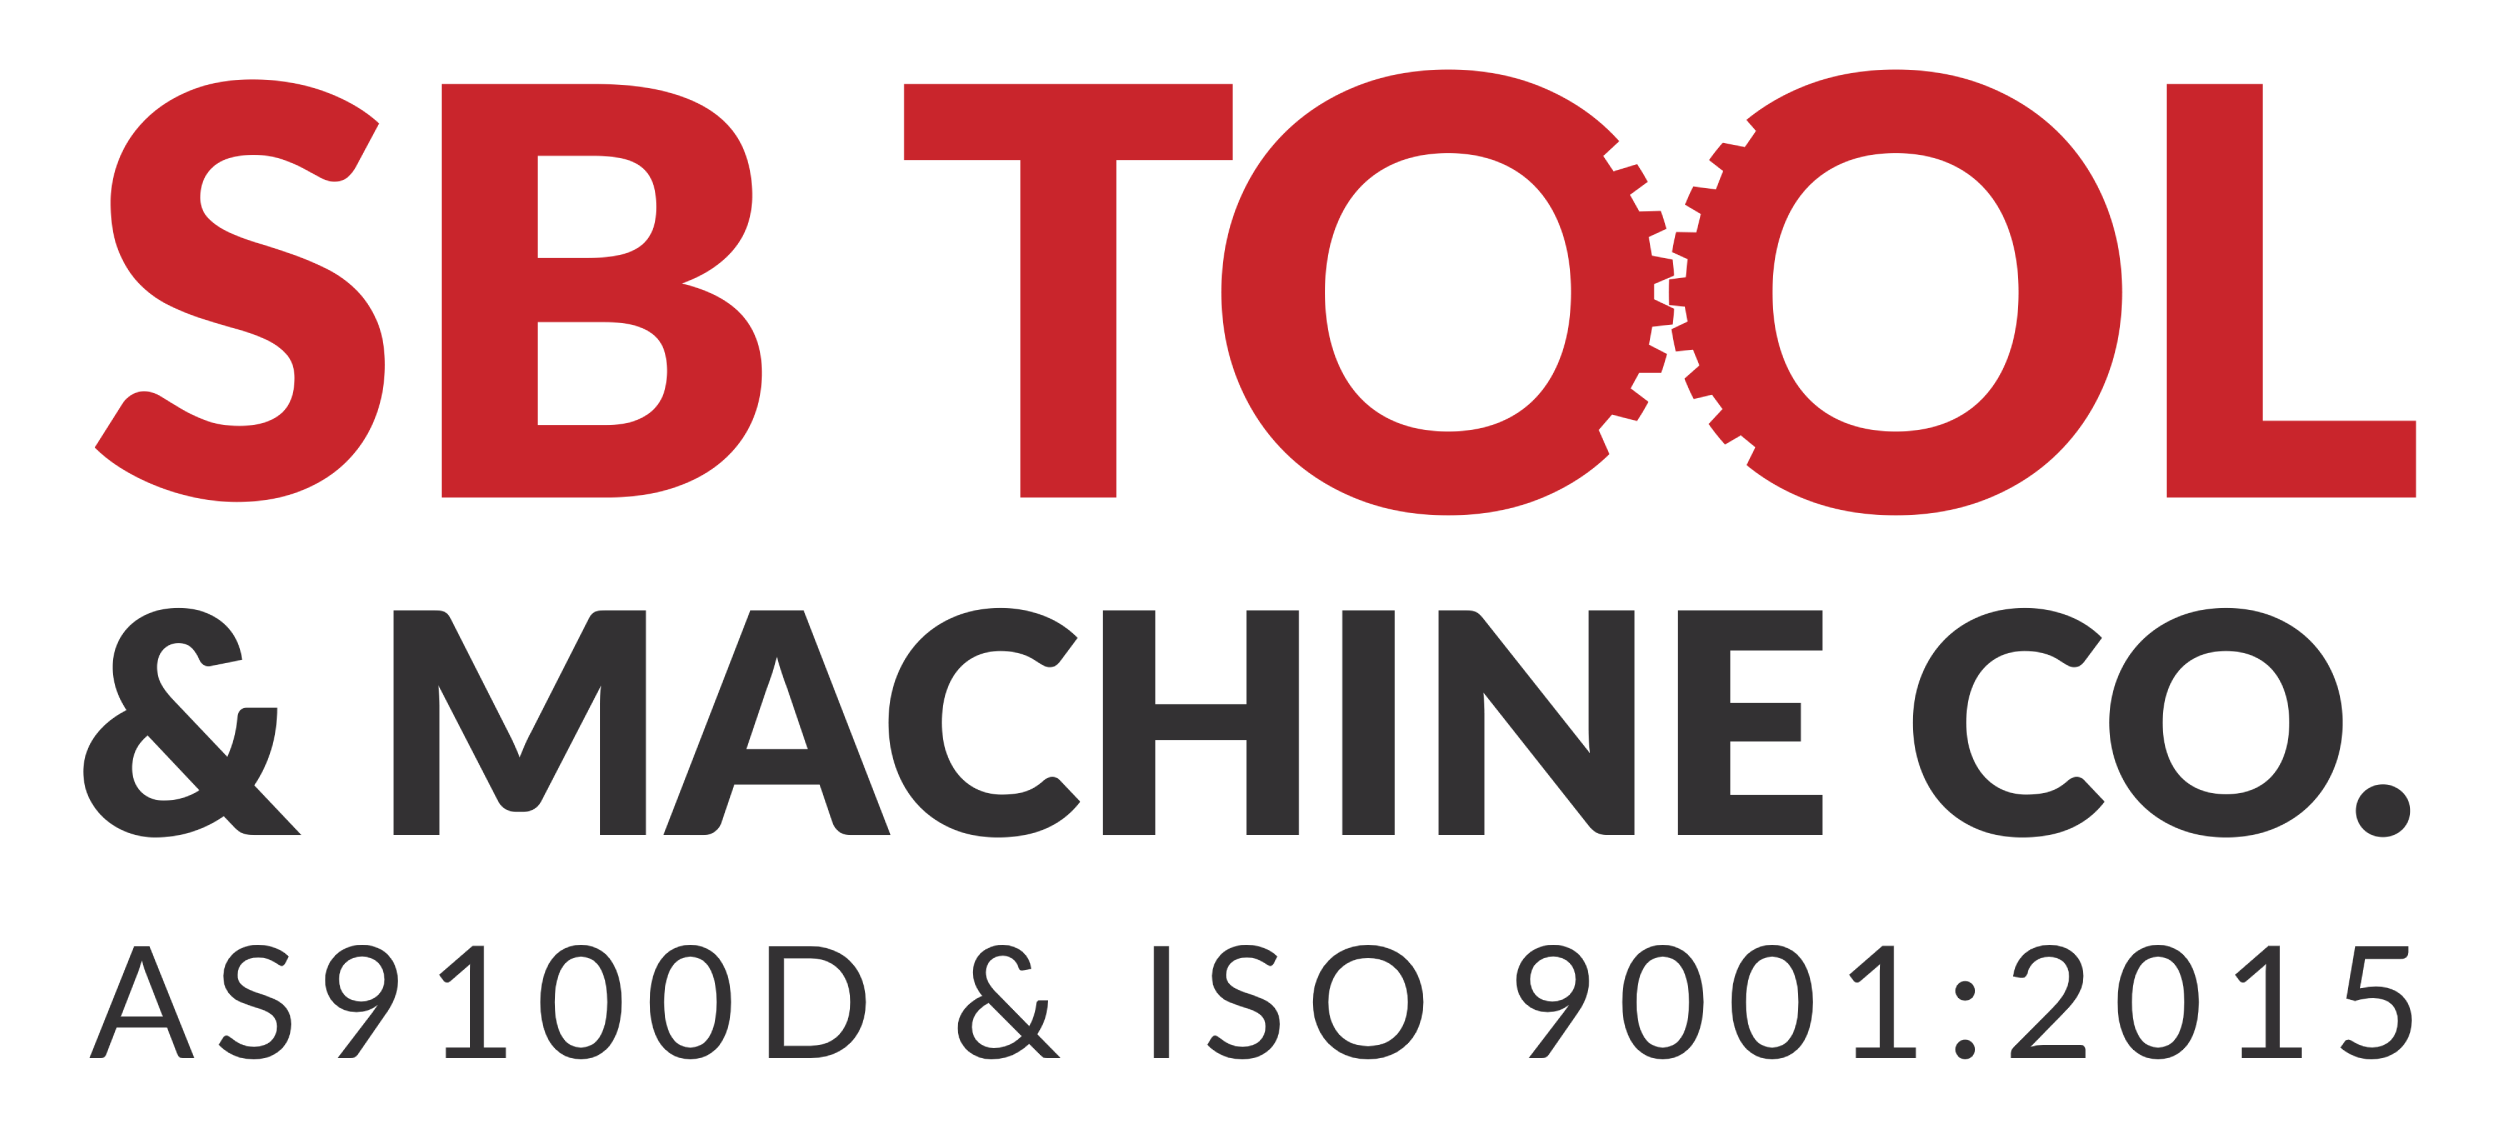 SB Tool & Machine Co.